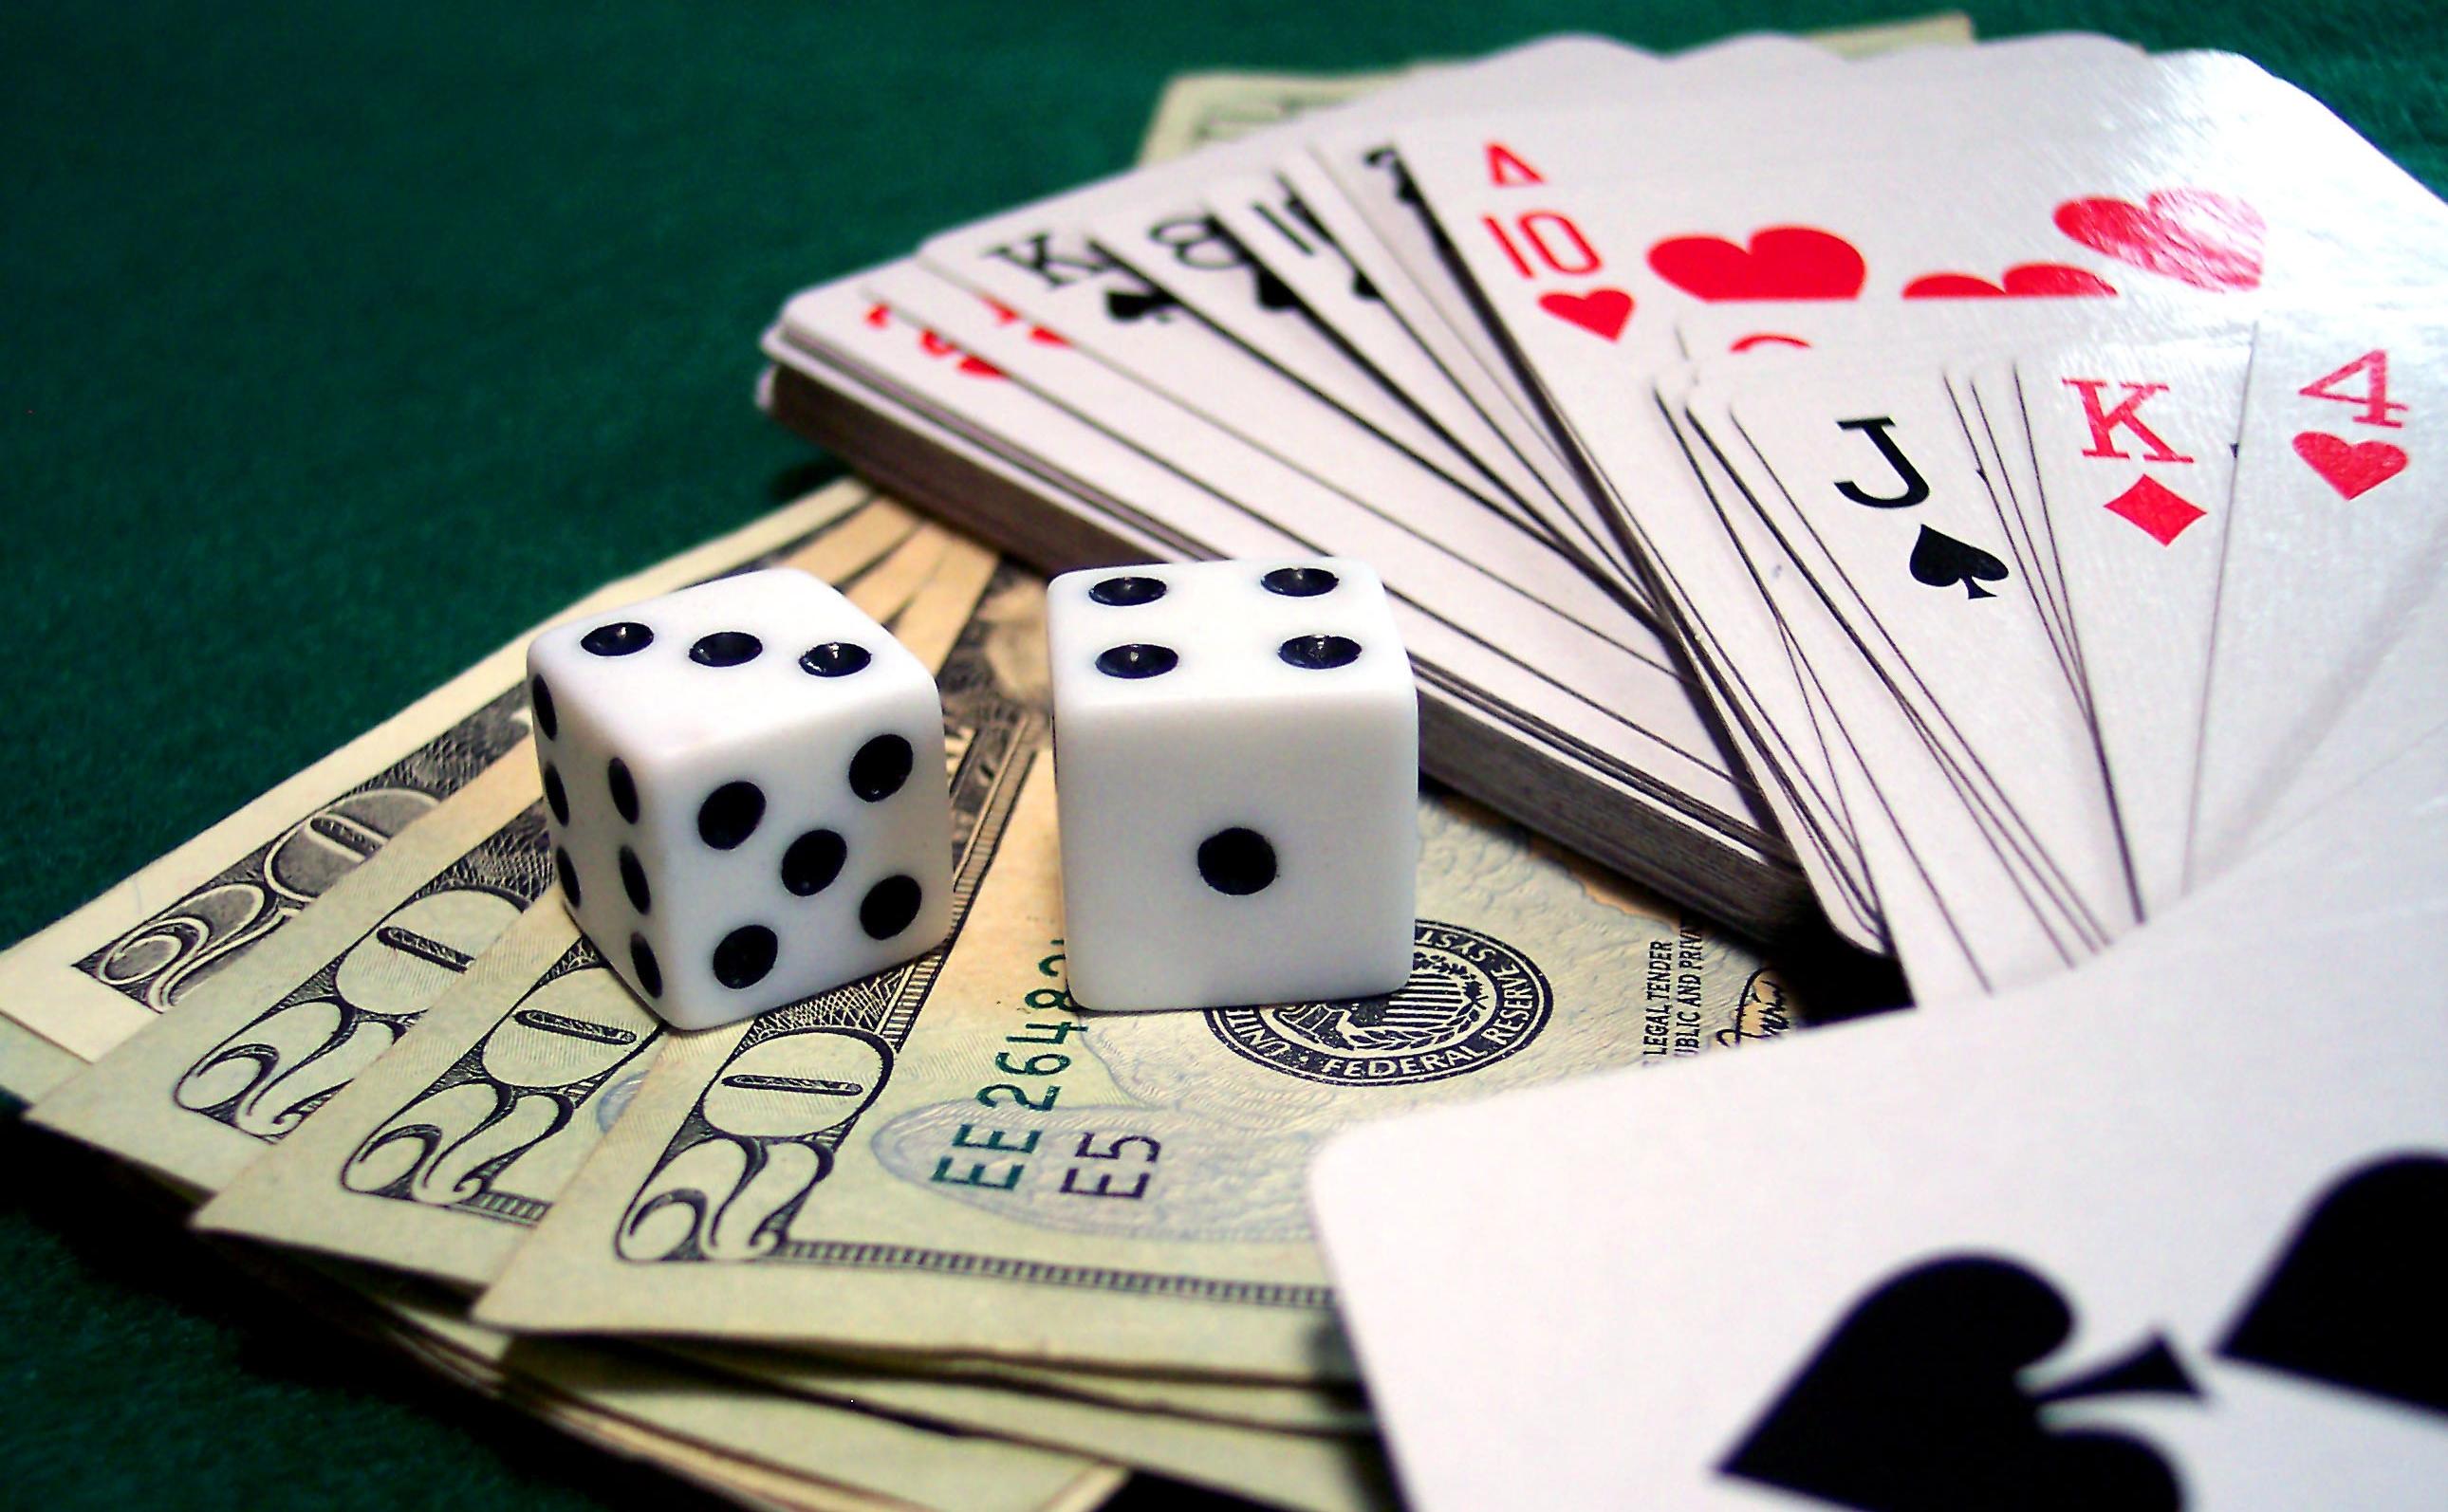 club one casino lawsuit